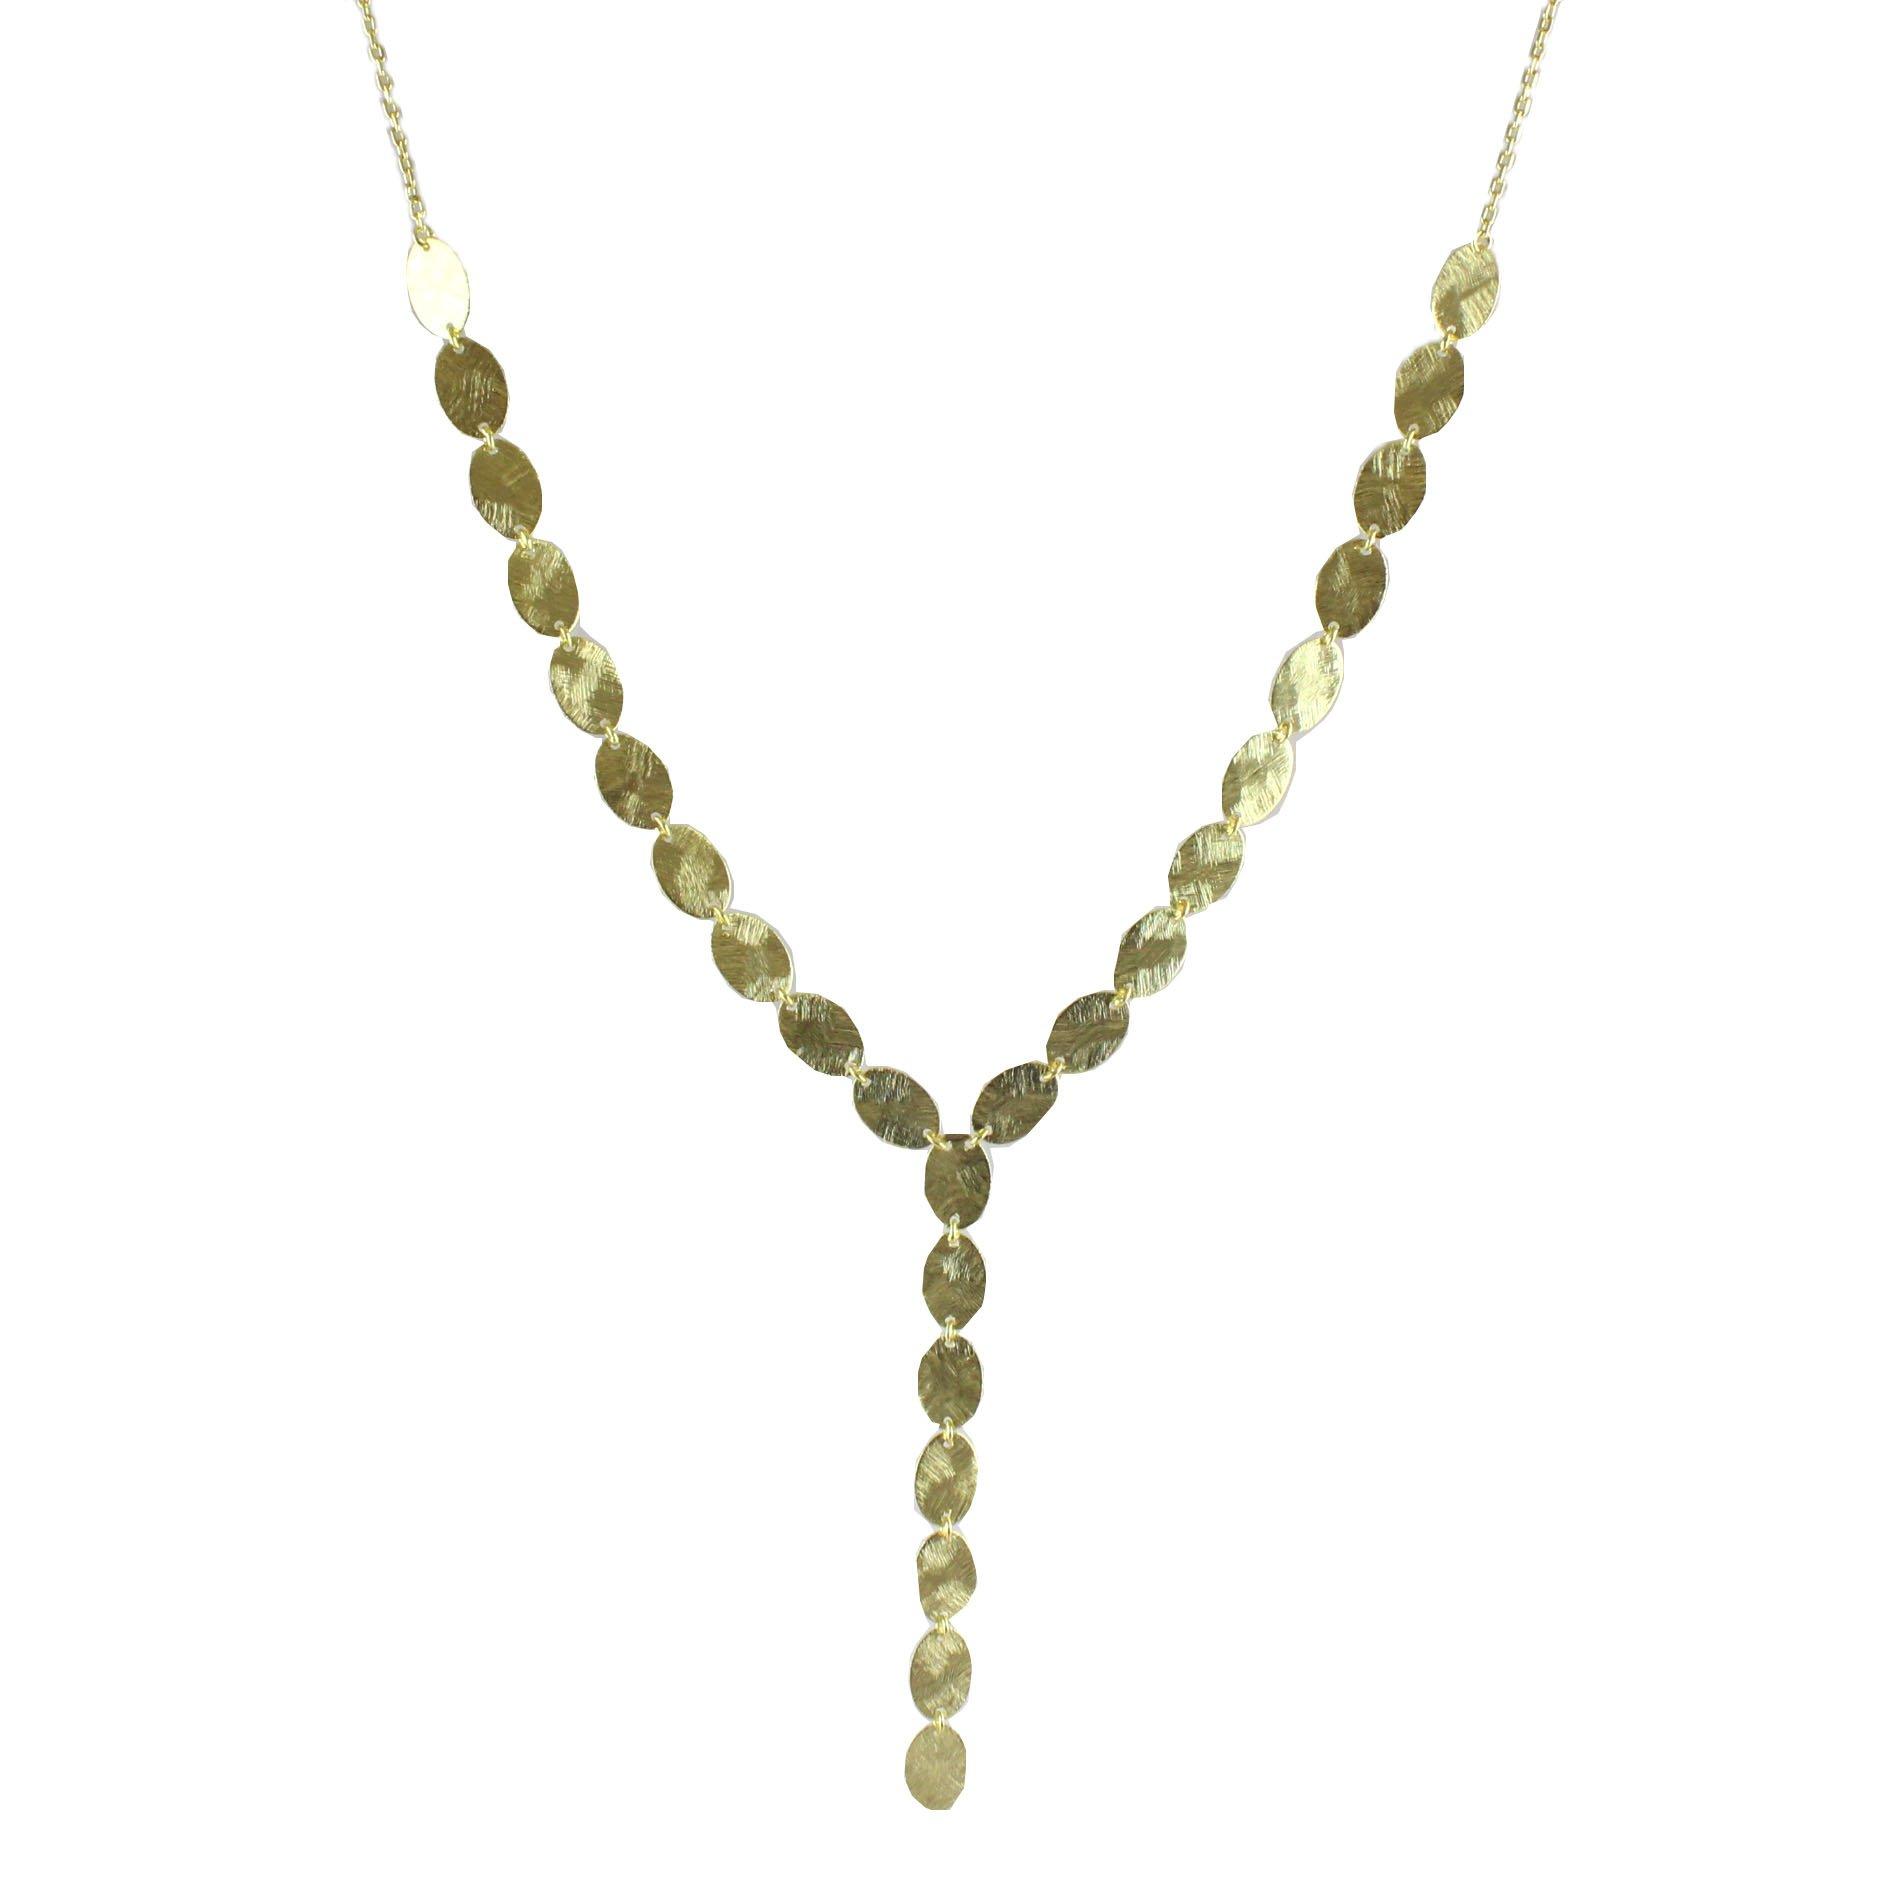 CO254_Tami_necklace_1024x1024@2x.jpg